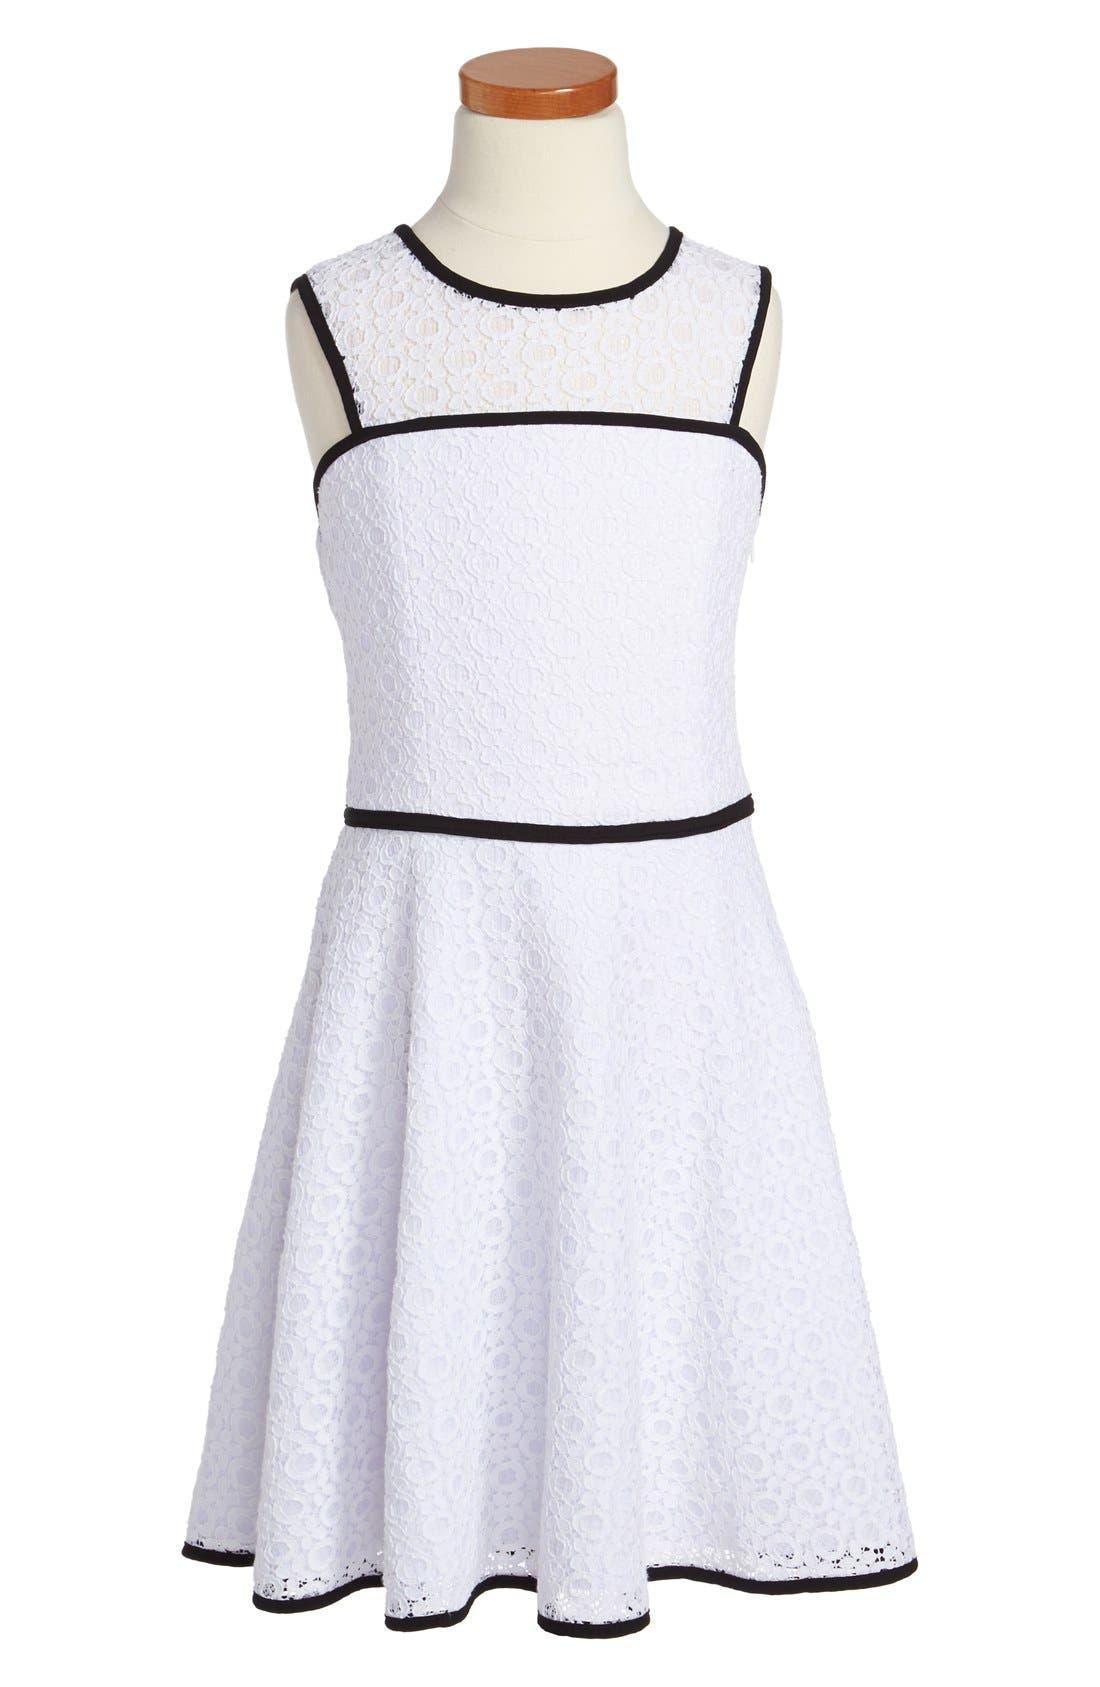 Main Image - Sally Miller 'XO' Lace Dress (Big Girls)